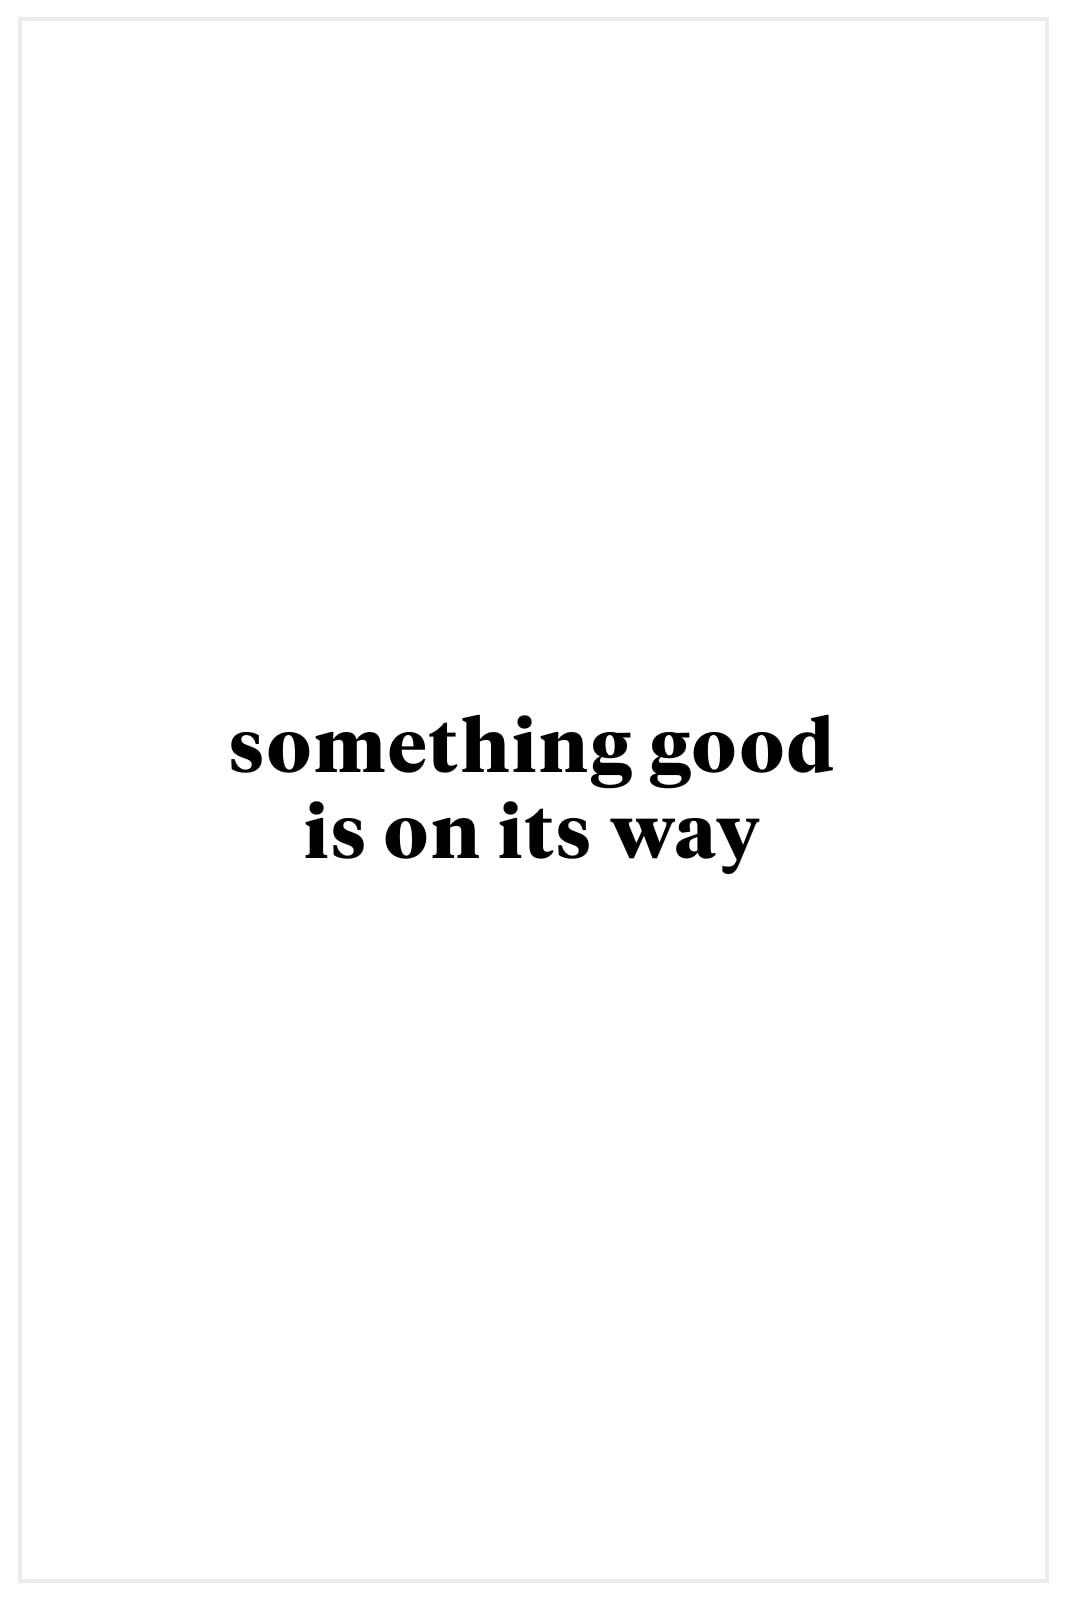 Evereve MaryJo Bold Ring Set